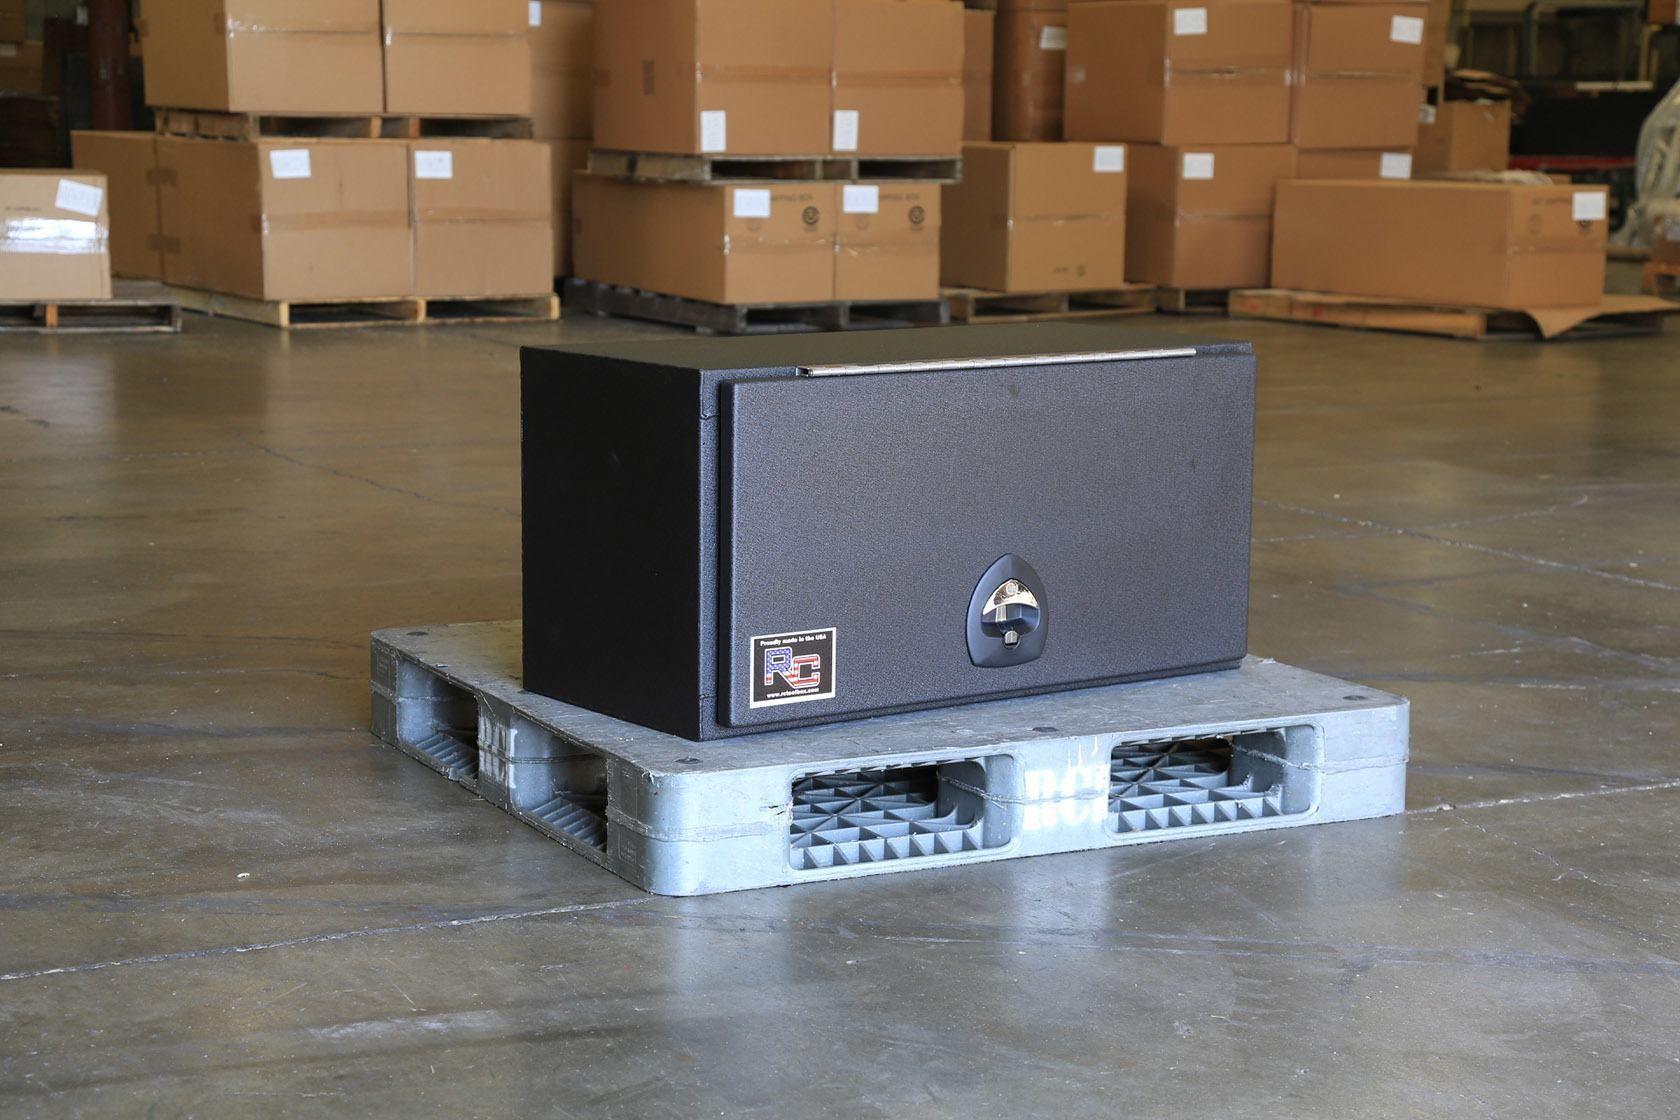 p series truck toolbox